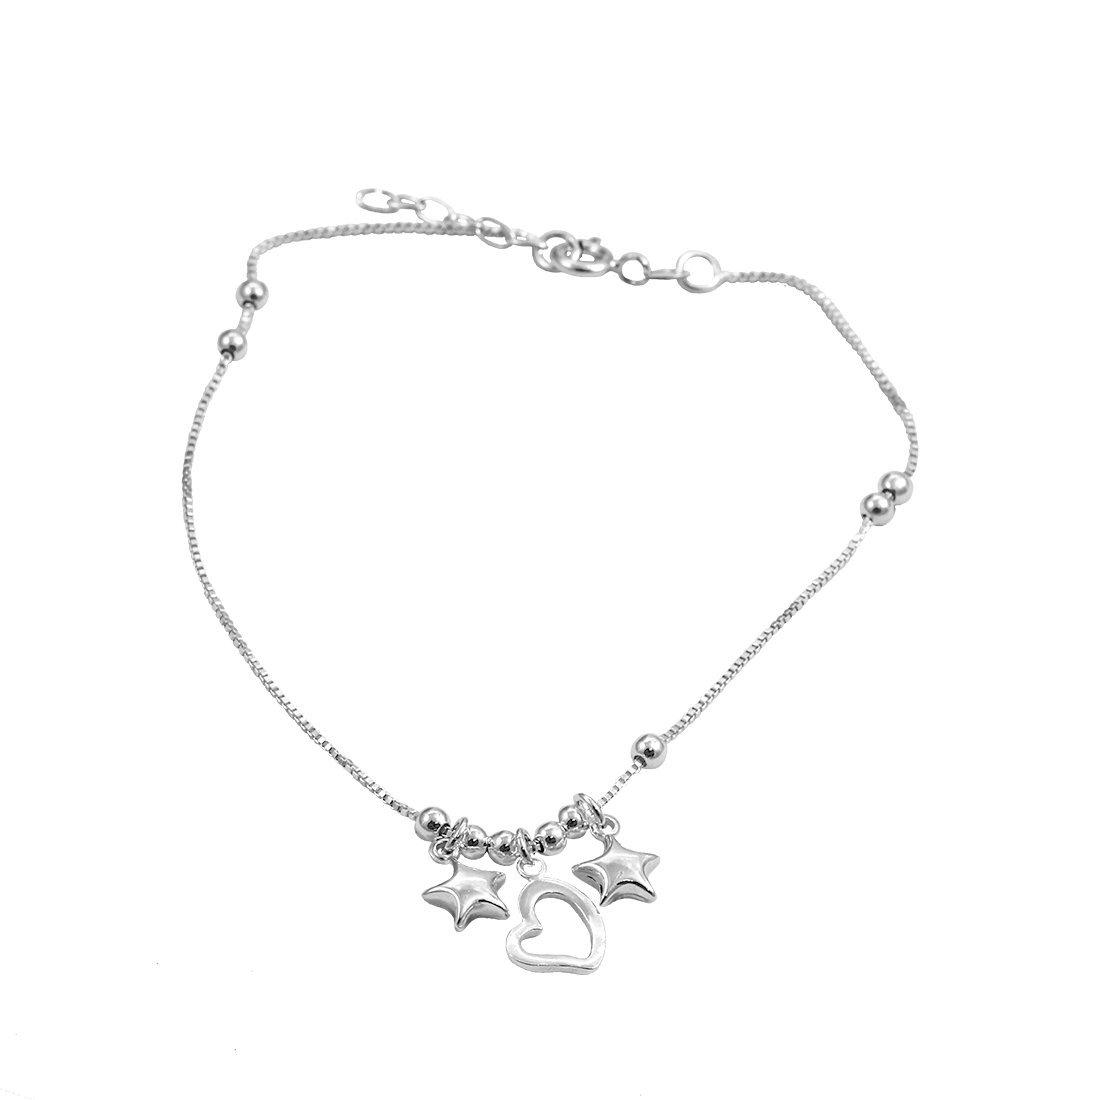 Blue Apple Co. Star Heart Bead Ball Design Anklet Bracelet 925 Sterling Silver 9''+1'' Extension